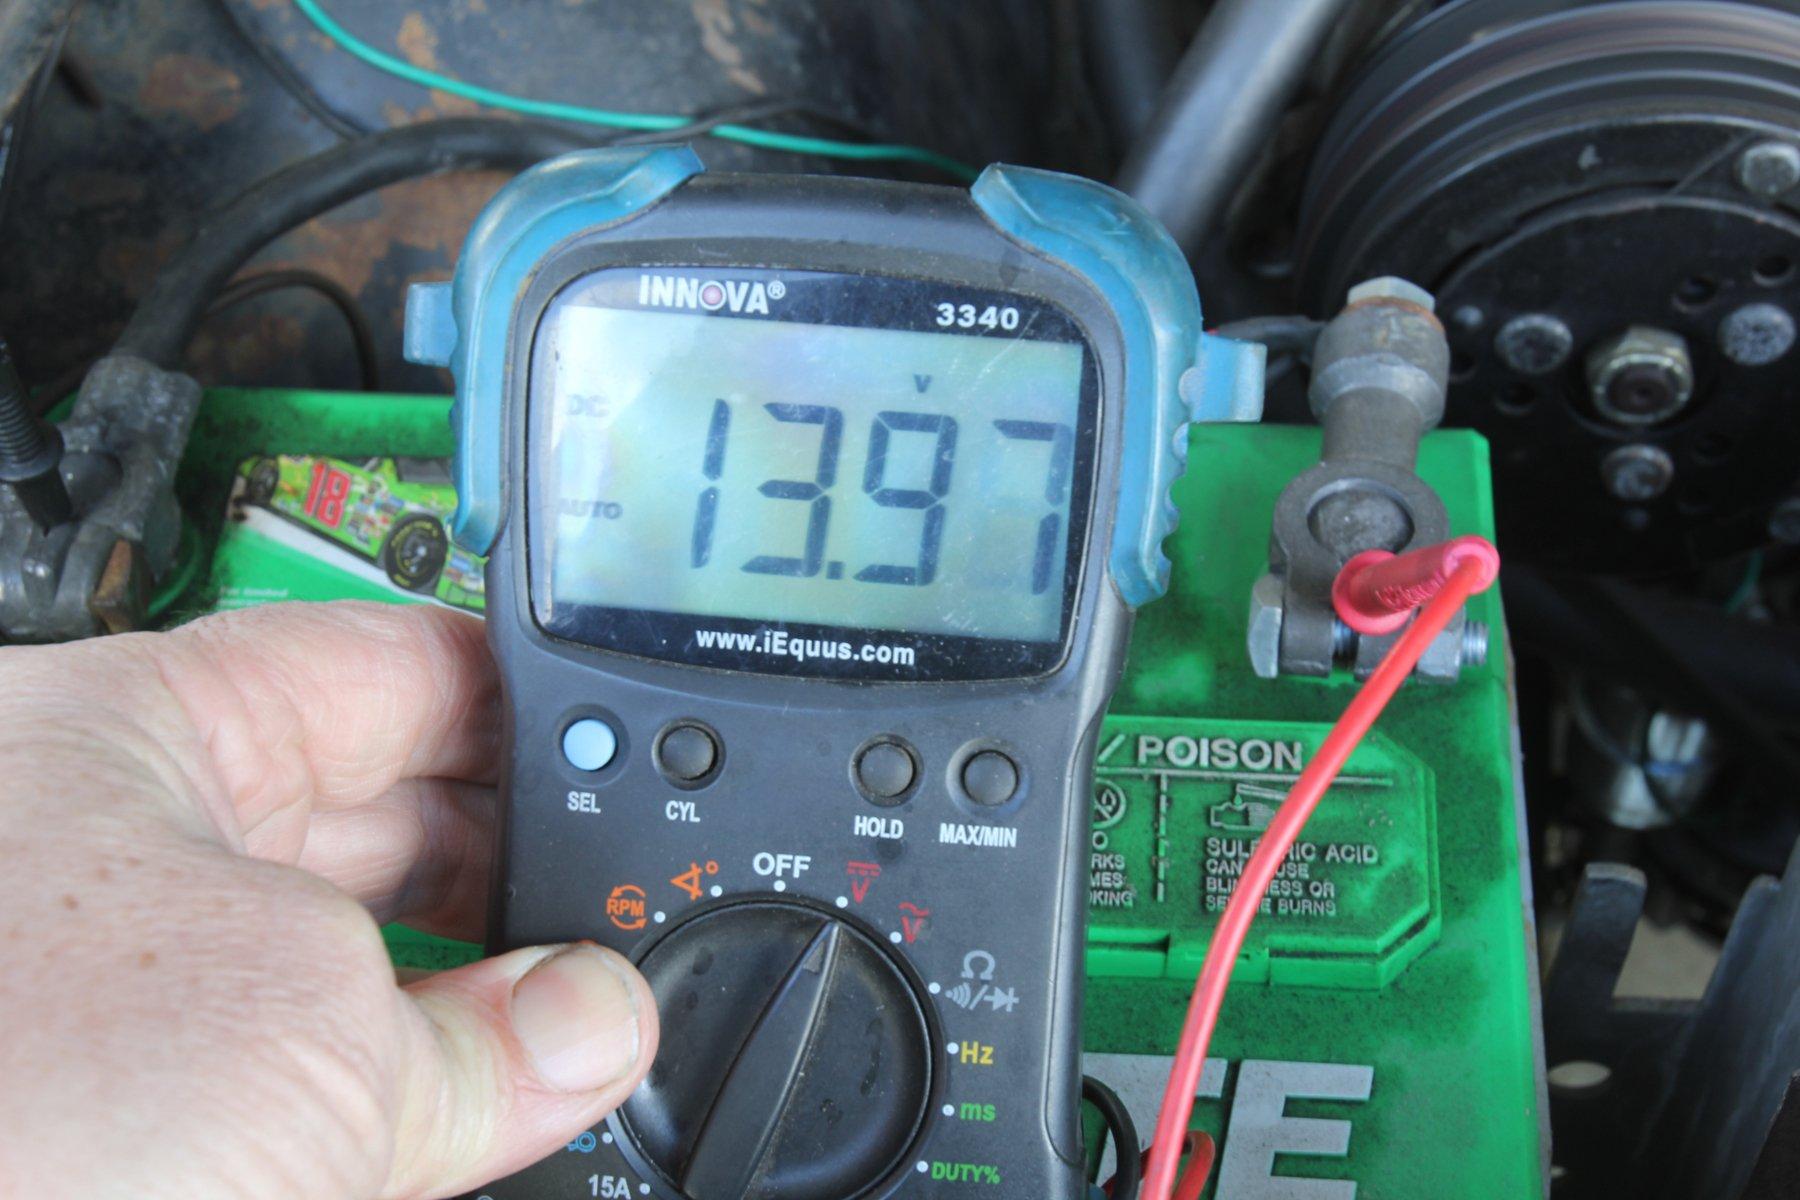 [DIAGRAM_0HG]  Alternator-Upgrade Wiring Tips for Popular GM Charging Systems | Late Model Gm Alternator Wiring Diagram |  | Rod Authority